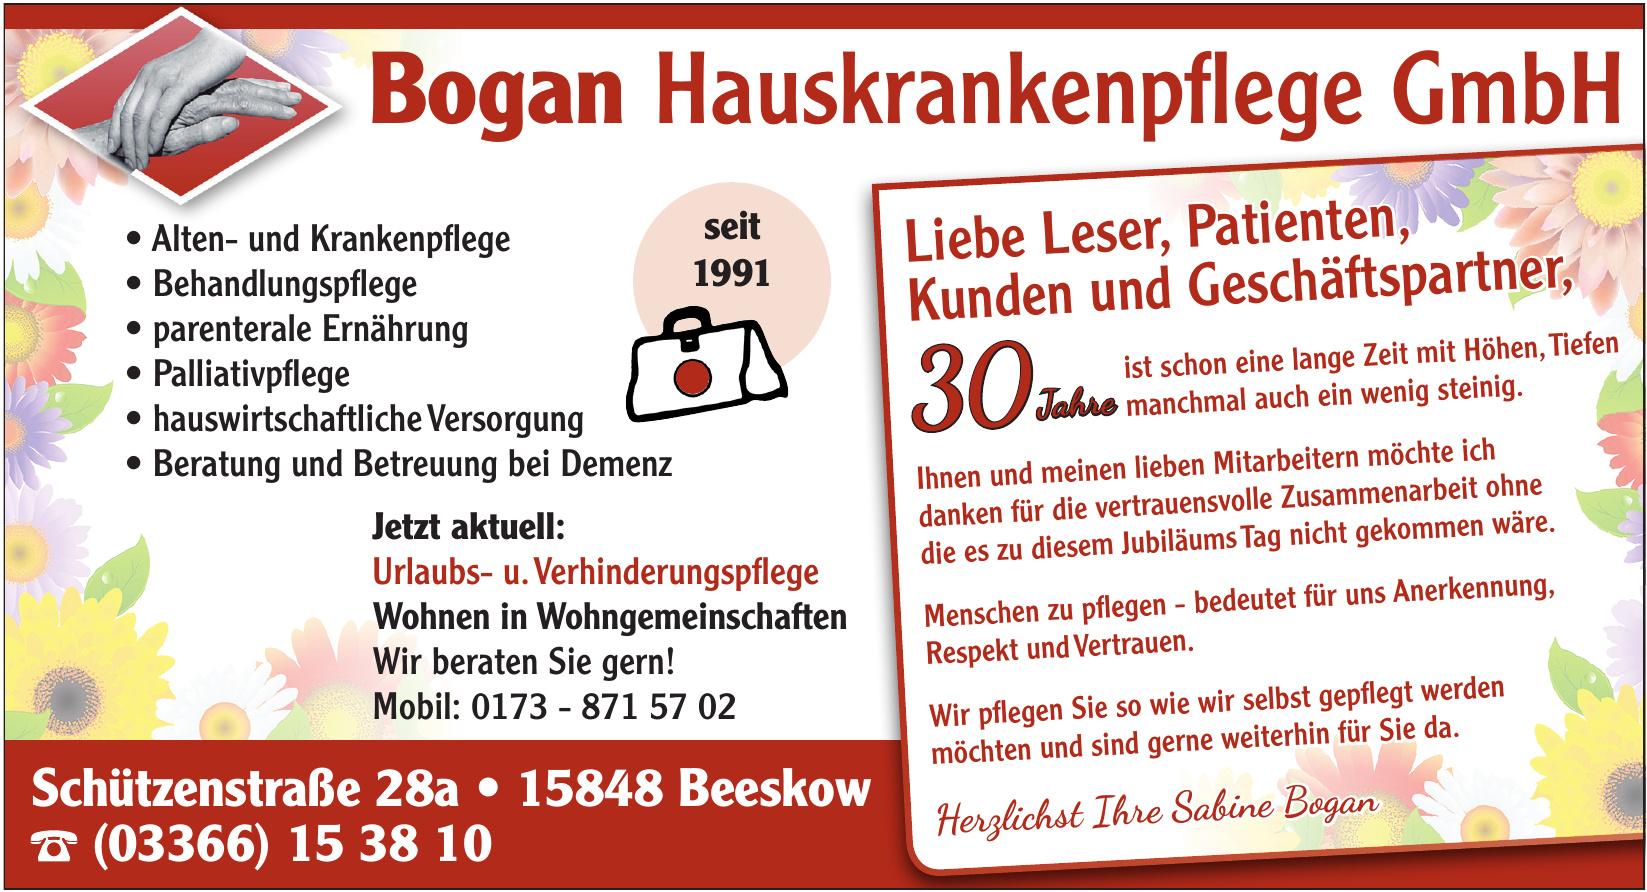 Bogan Hauskrankenpflege GmbH